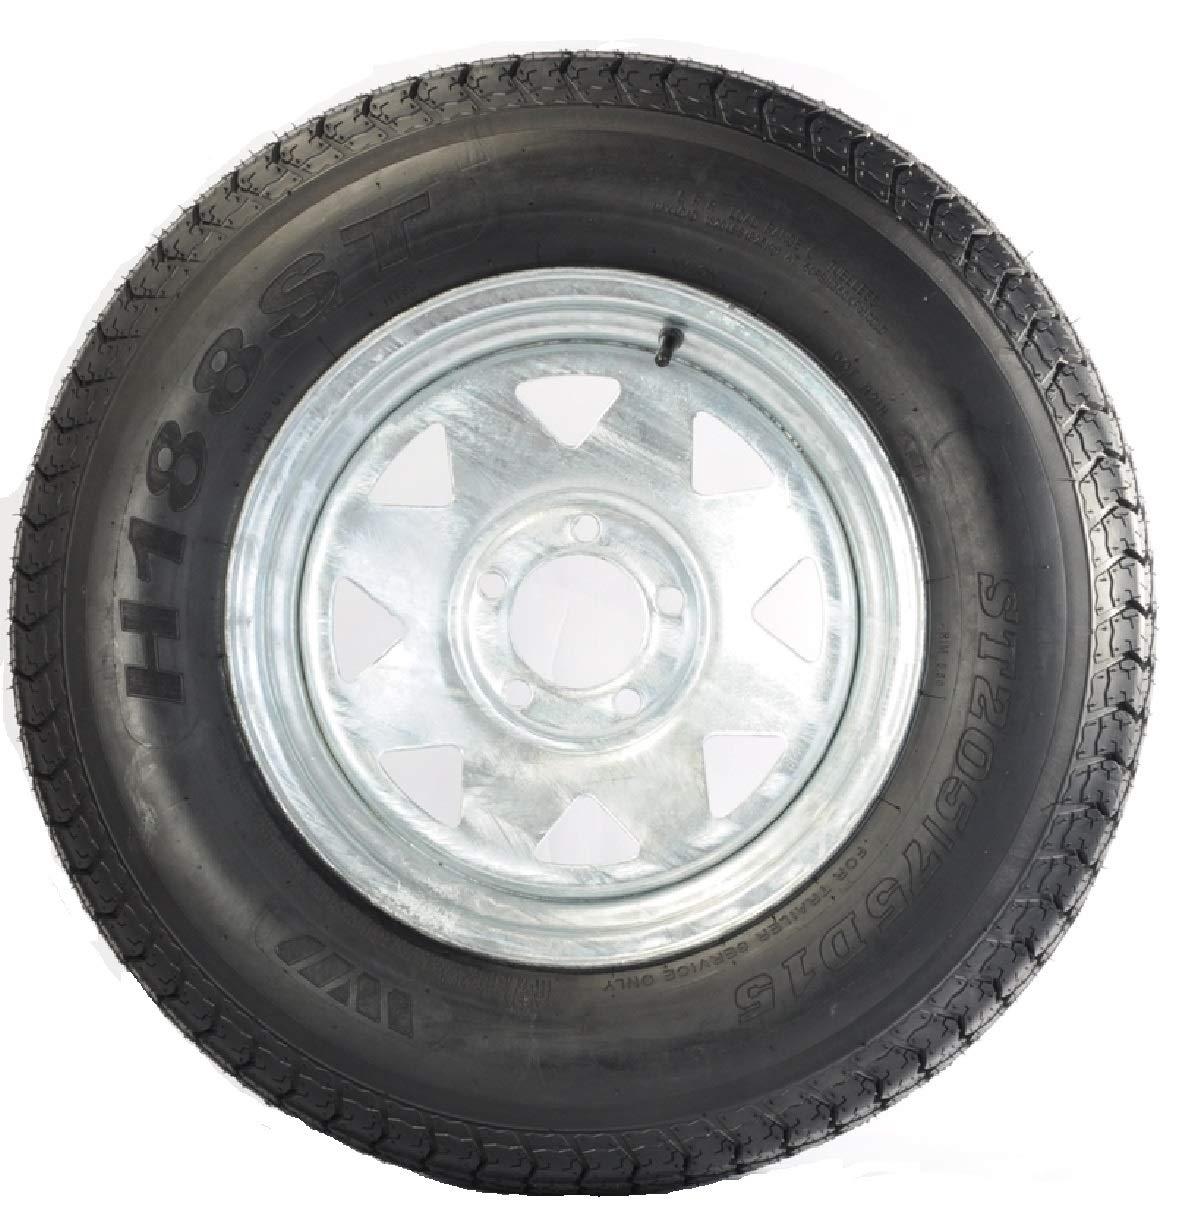 LRC 5 Hole Galvanized Spoke eCustomRim Trailer Tire On Rim ST205//75D15 205//75 D 15 in